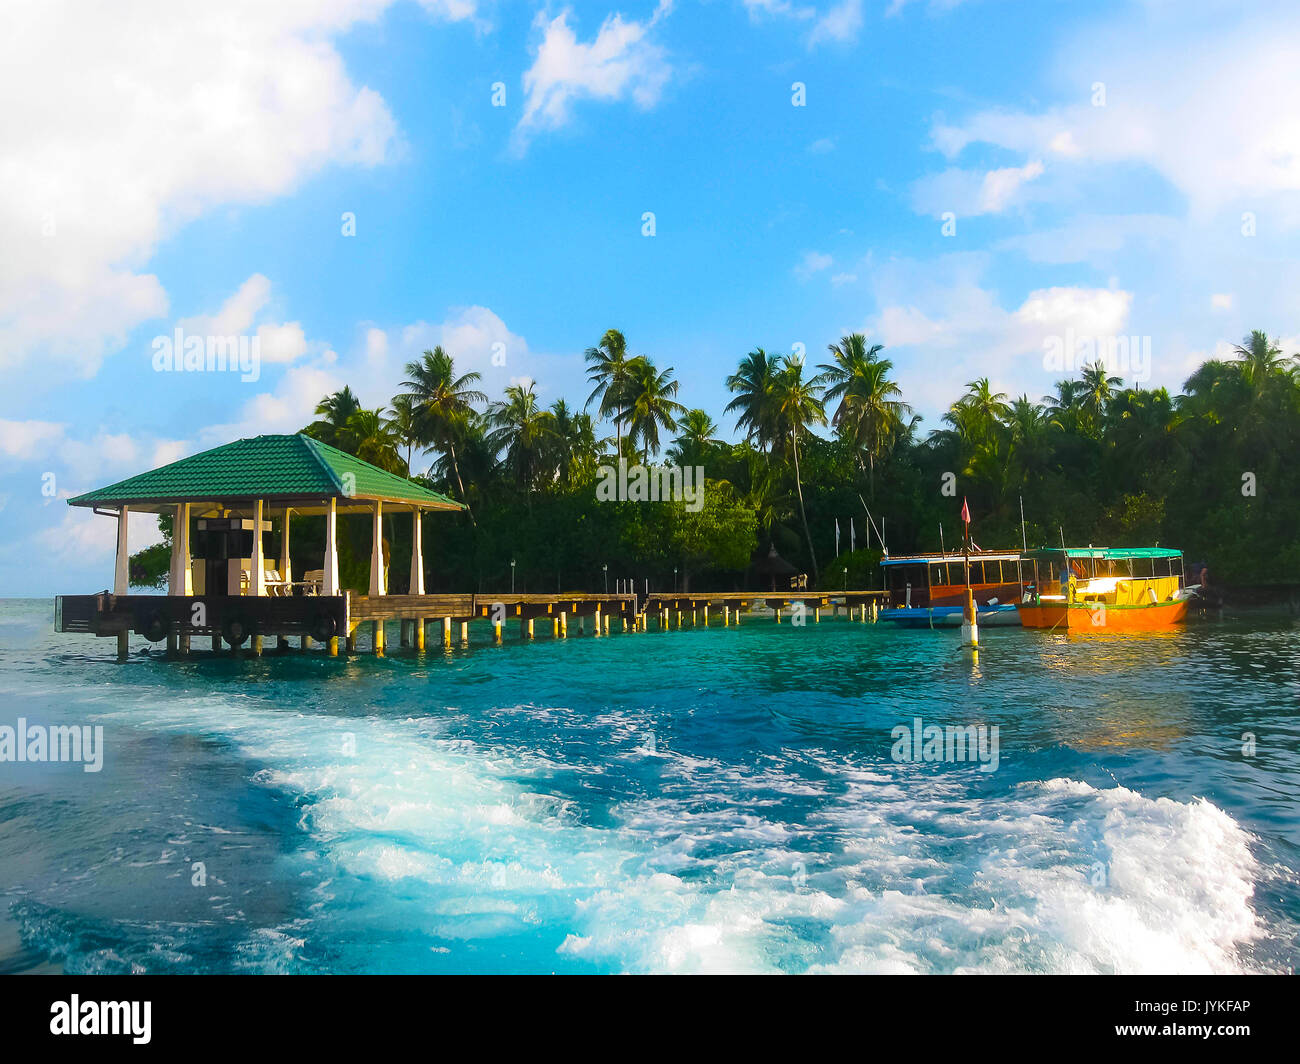 Embudu Village Island, Maledives, Indian Ocean - Stock Image